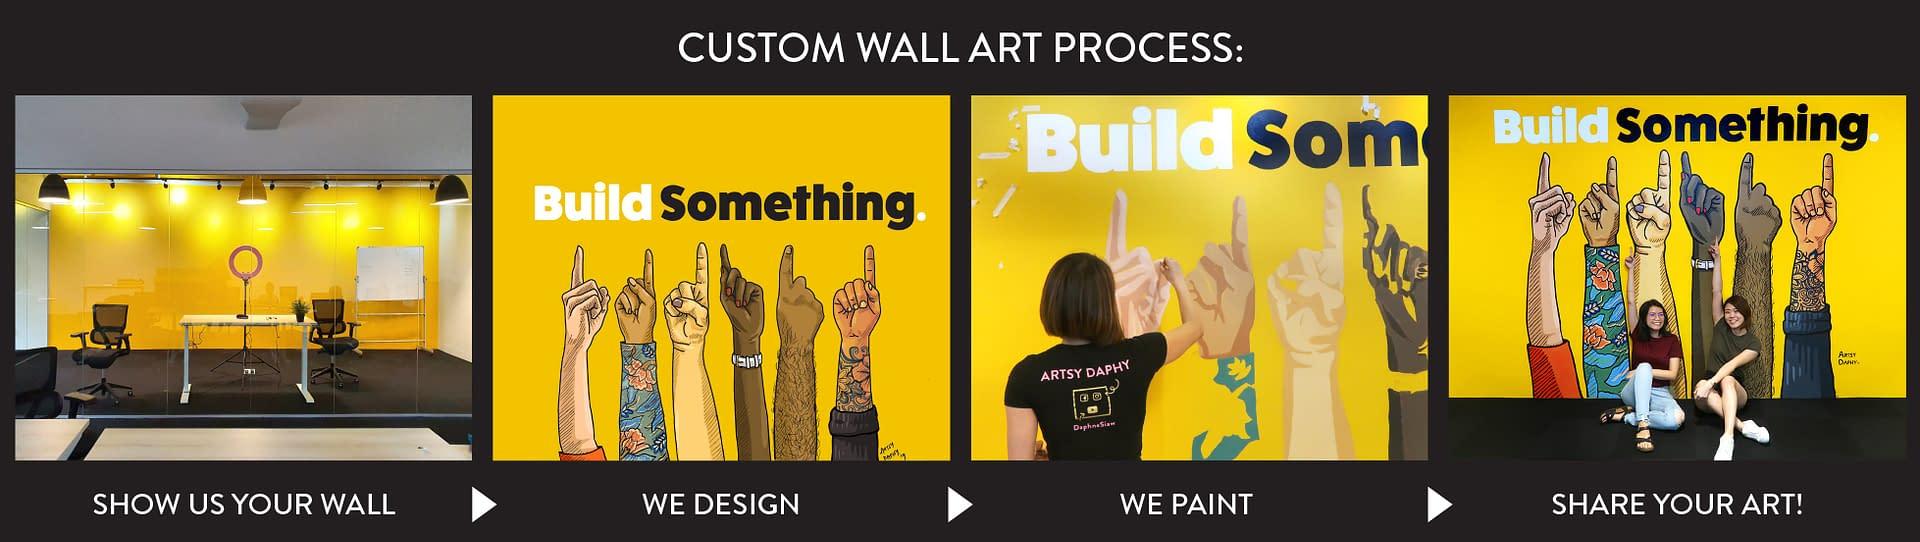 Sarawak Wall Artist Custom Wall Art Creation Process